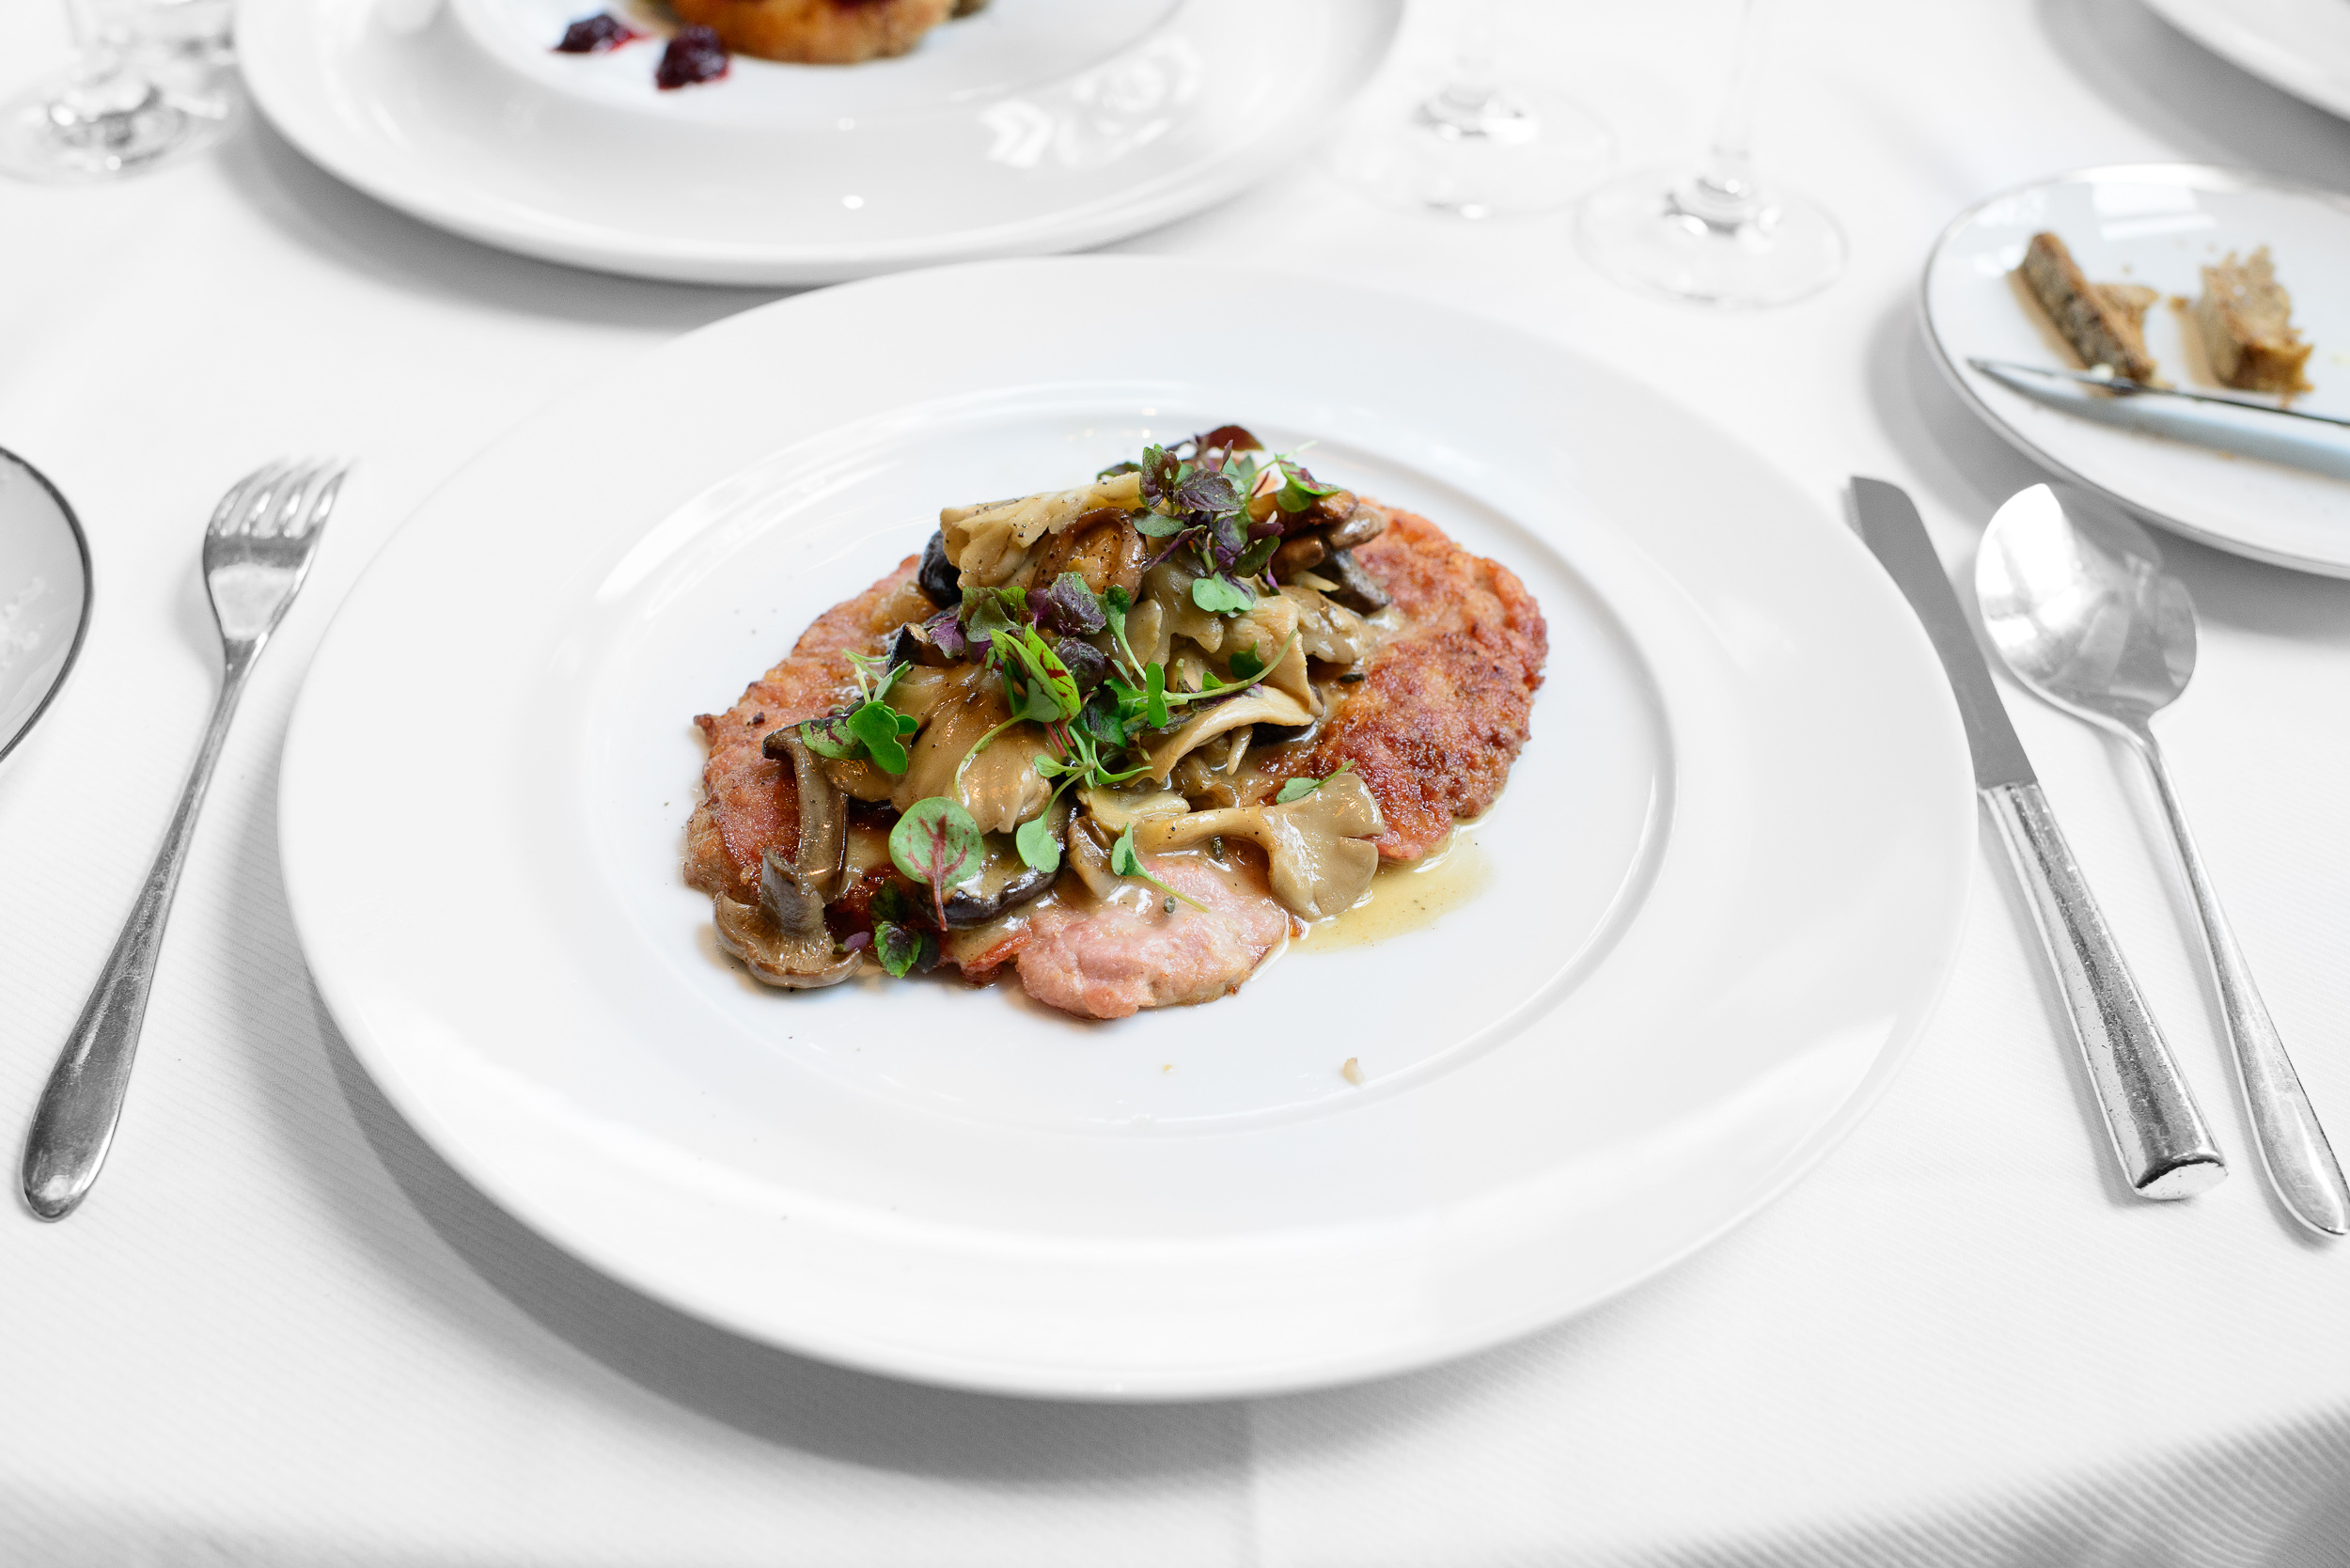 Sauteed veal scallopine, flying pig ham, mushroom, spring onion